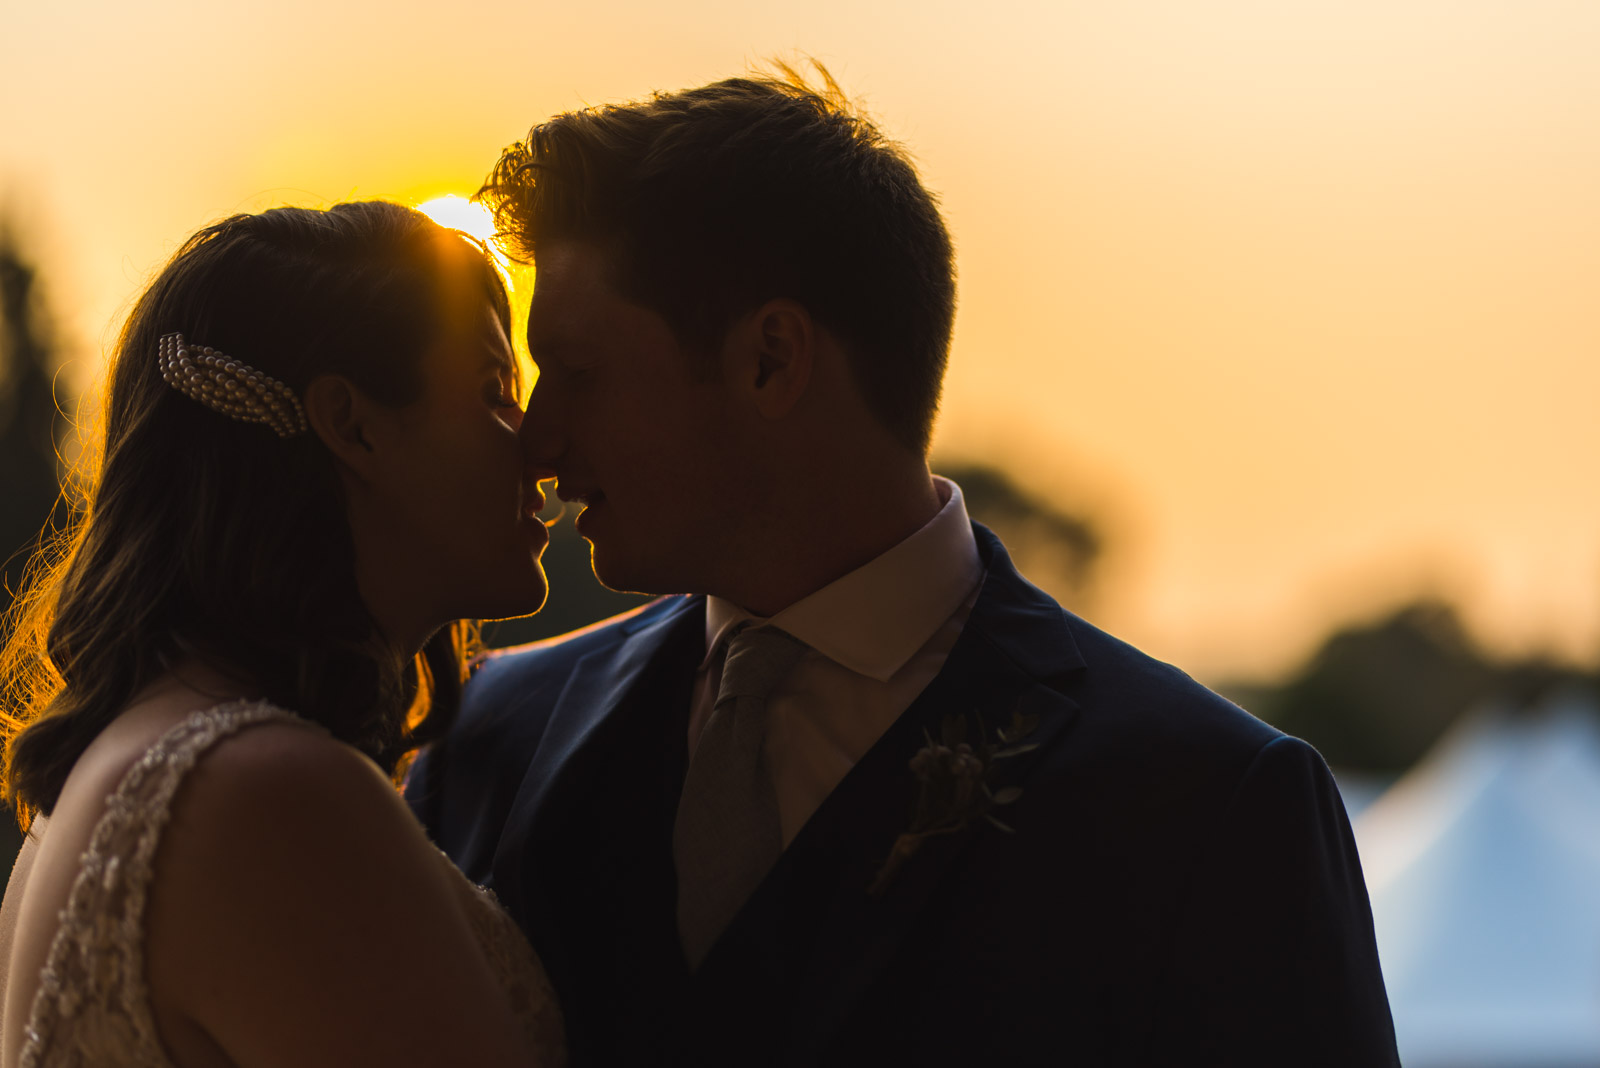 Emerson & Elicia's Golf Course Wedding Aidan & Leanne Hennebry Hamilton Wedding Videographers Photographers Niagara Hush Hush Photography & Film-66.jpg